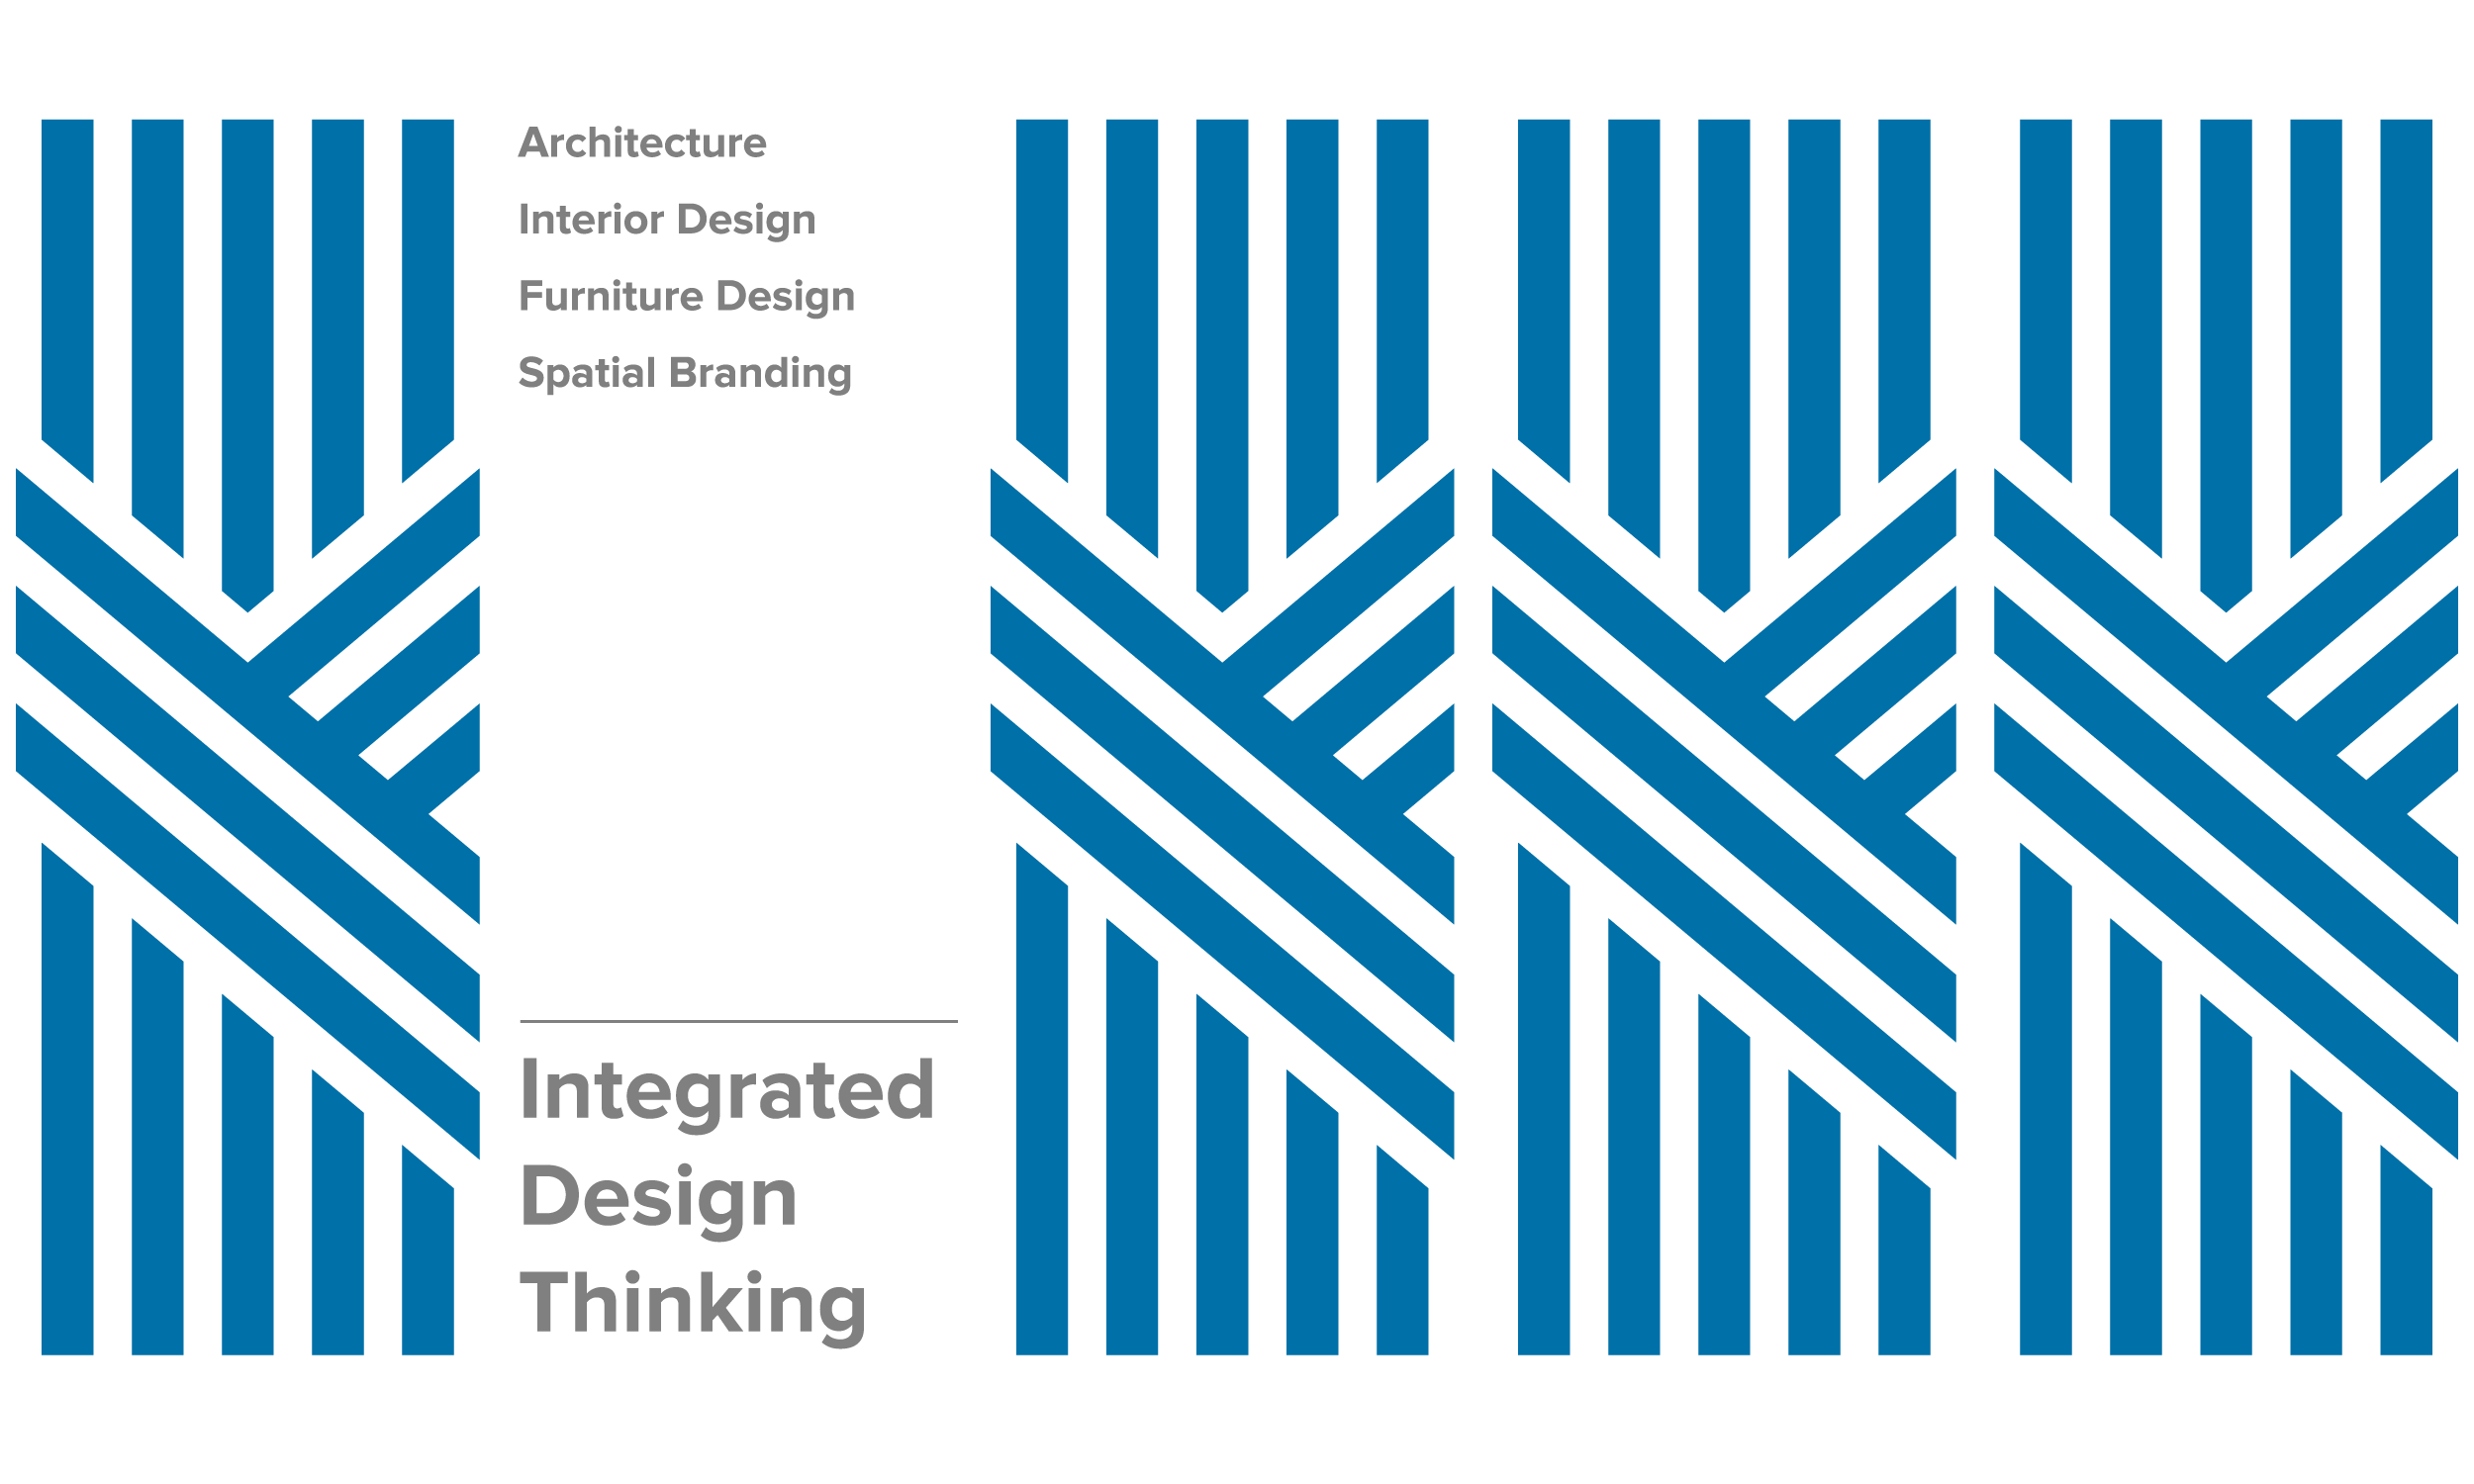 Integrated Design Thinking